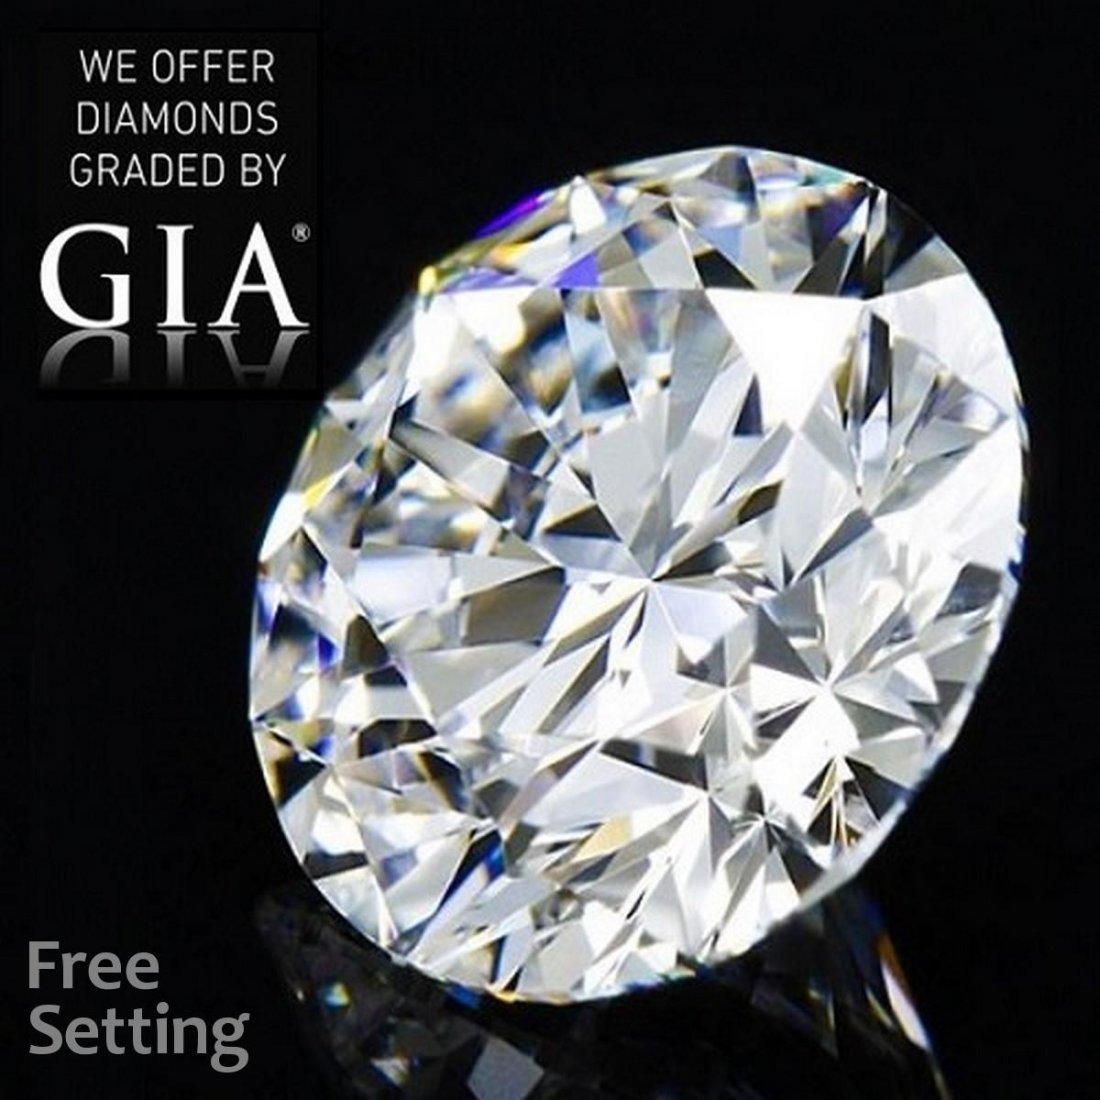 8.01 ct, Color D/FL, Round cut Diamond